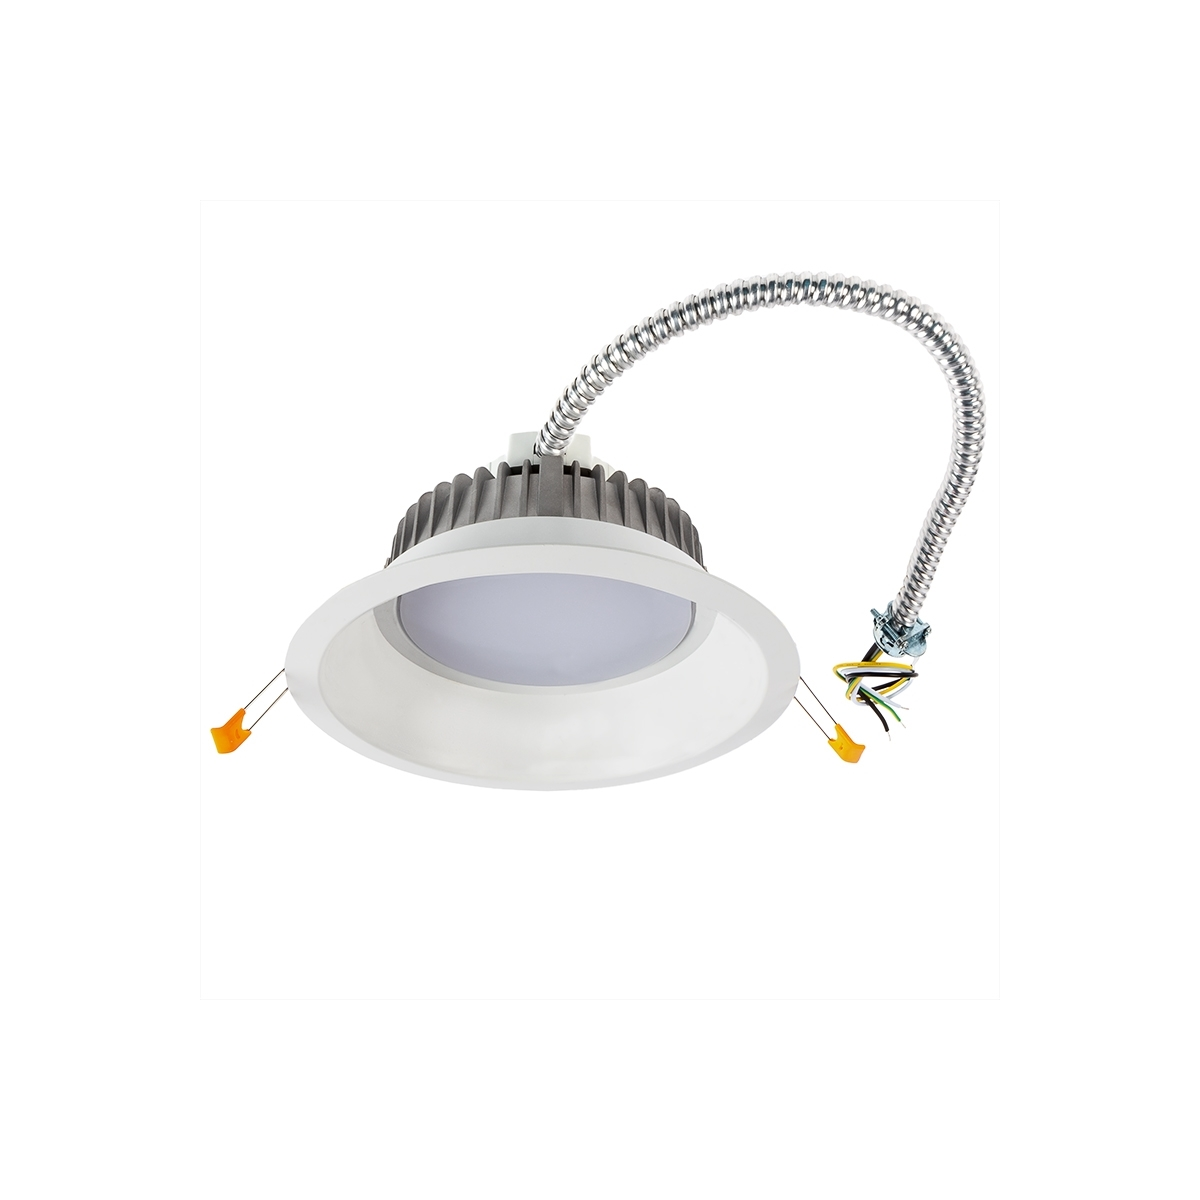 Westgate LED Recessed Light 9W 4 Inch Ultra Slim Square Downlight Retrofit